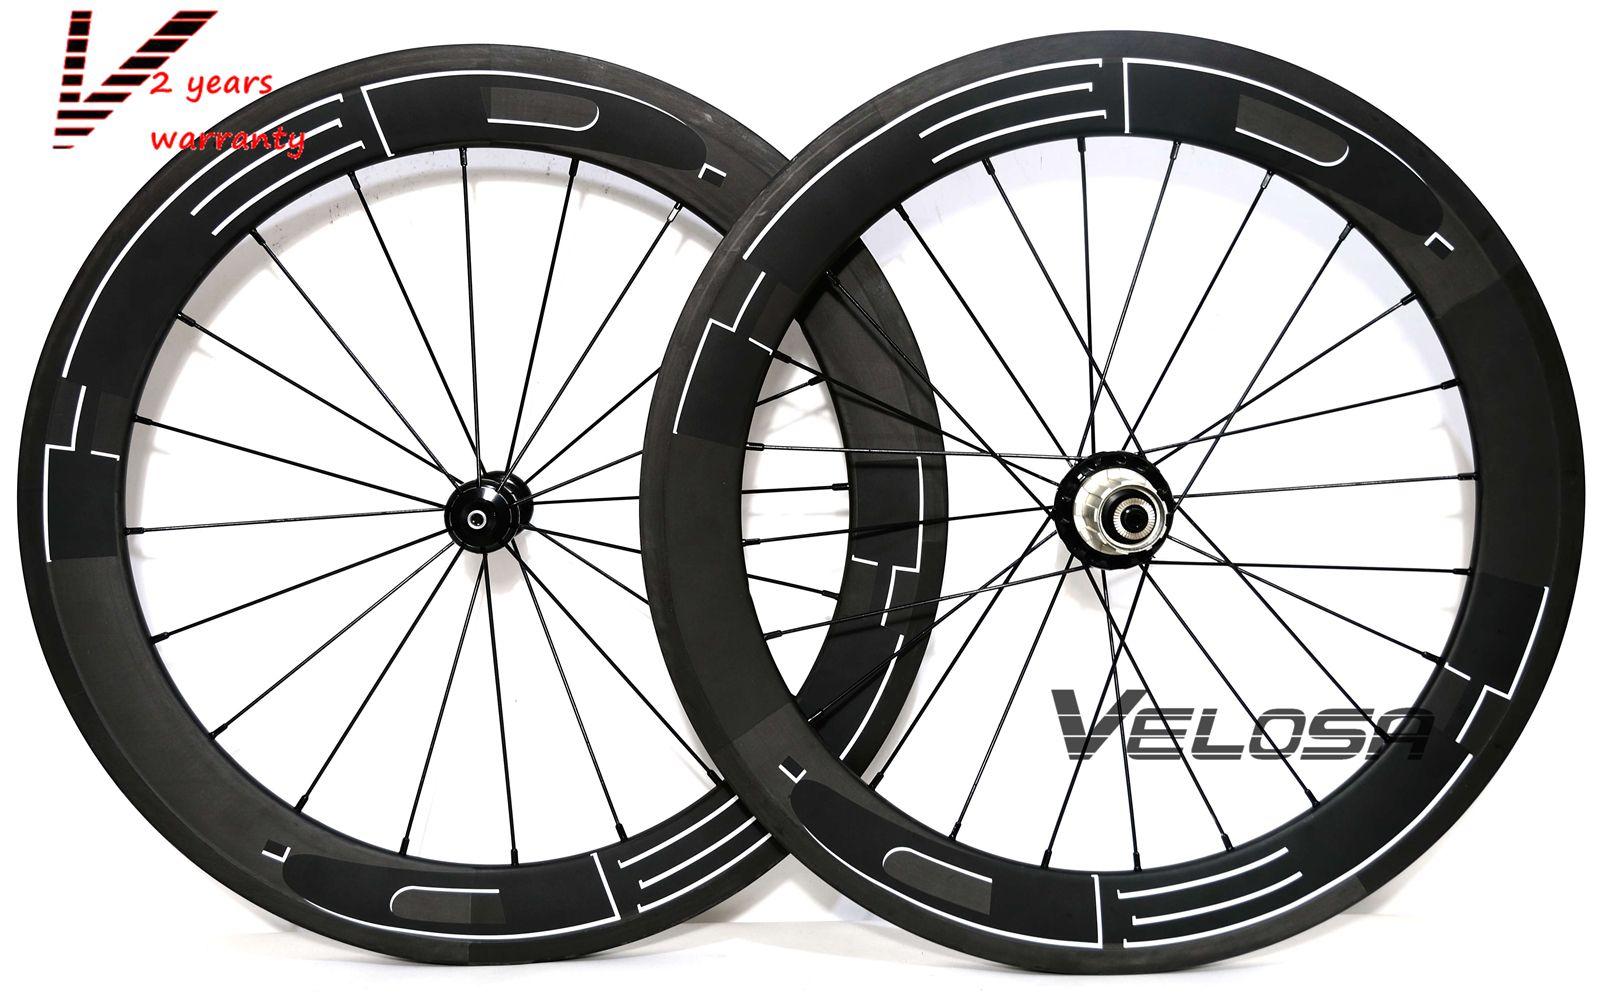 20 Inch Bike Wheel Full Carbon 451 Wheelset 406 Wheelset 50mm Clincher 20 Inch Folding Bike Wheel 29 Mountain Bike Wheels 29 Bike Wheels From Audi1943 405 23 Dhgate Com